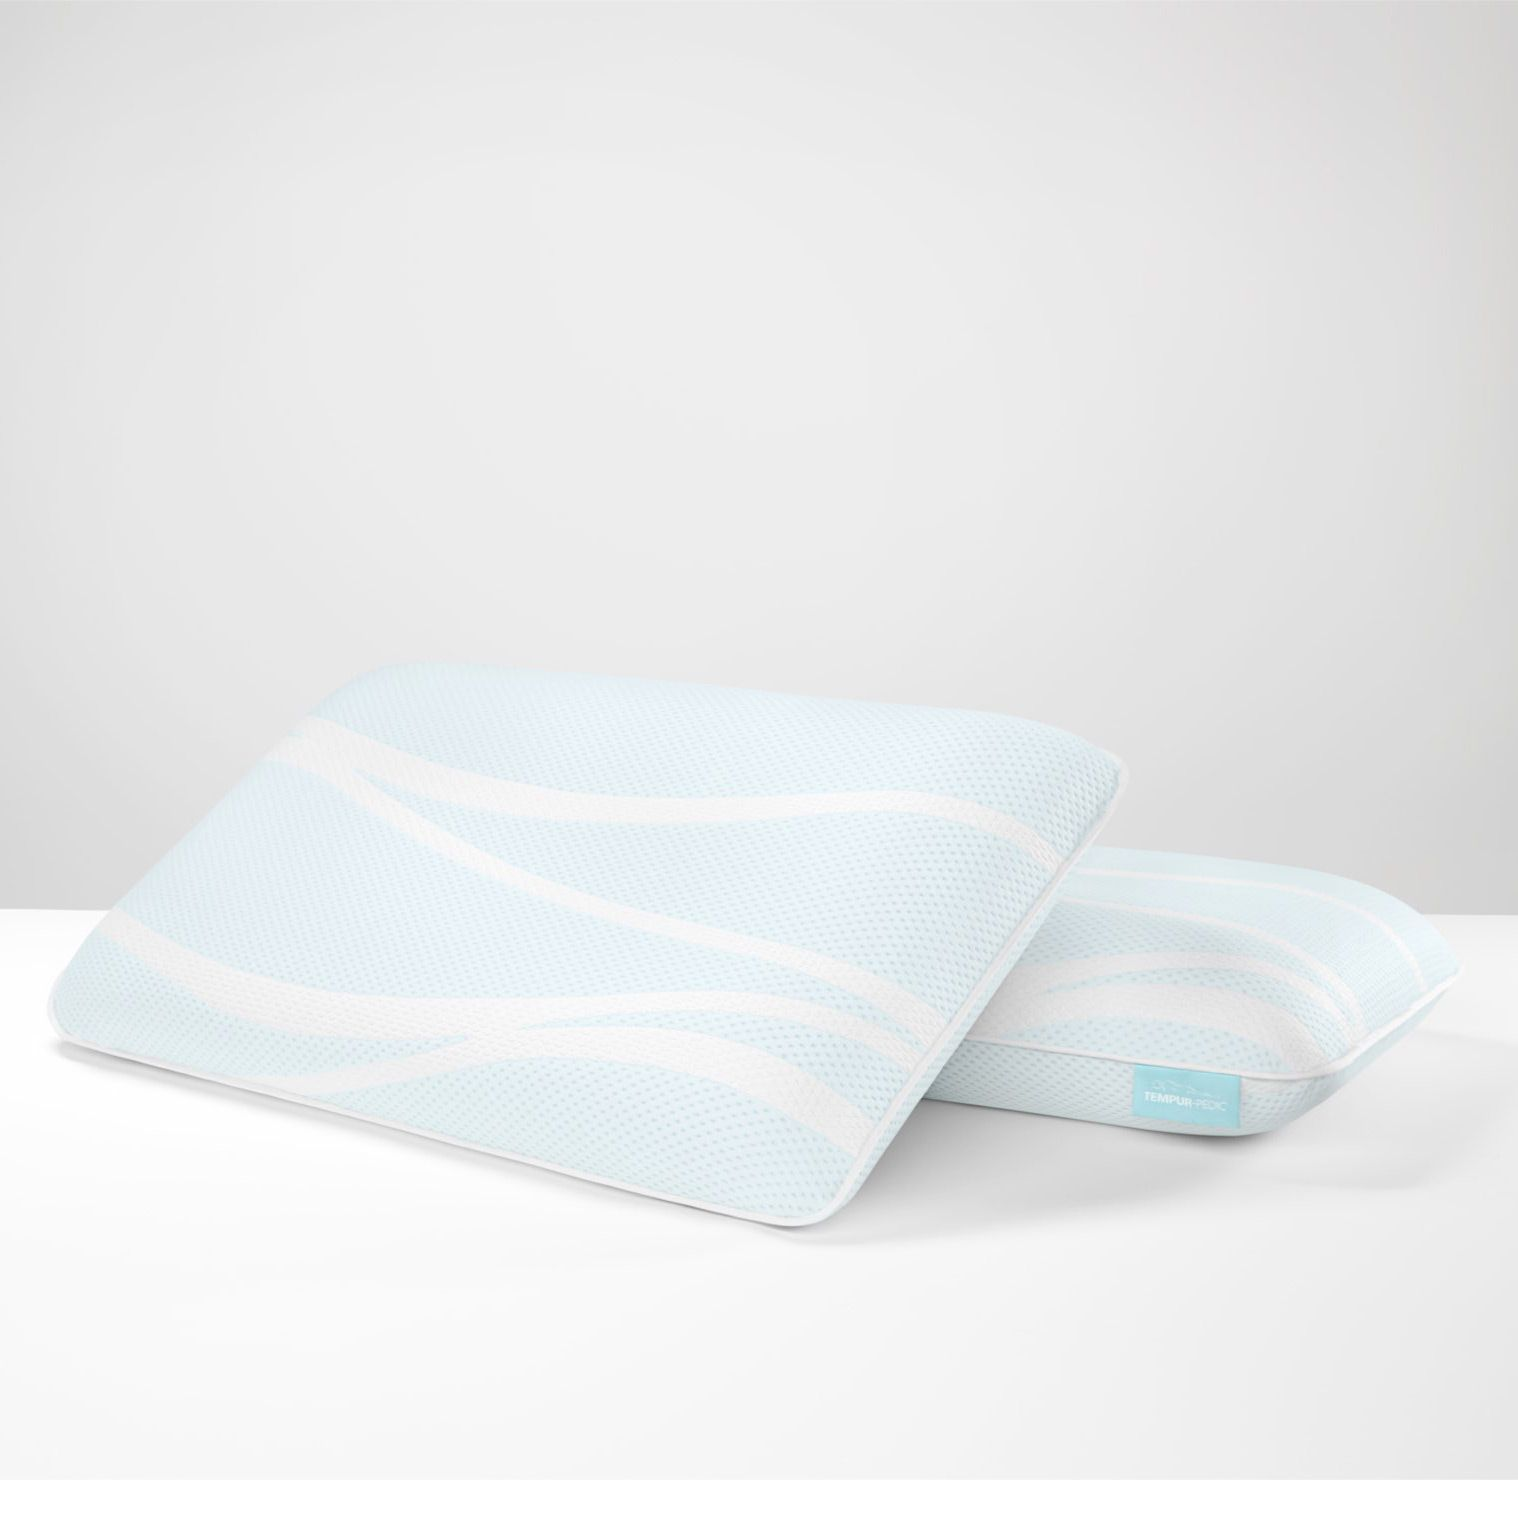 breeze pro advanced cooling pillow